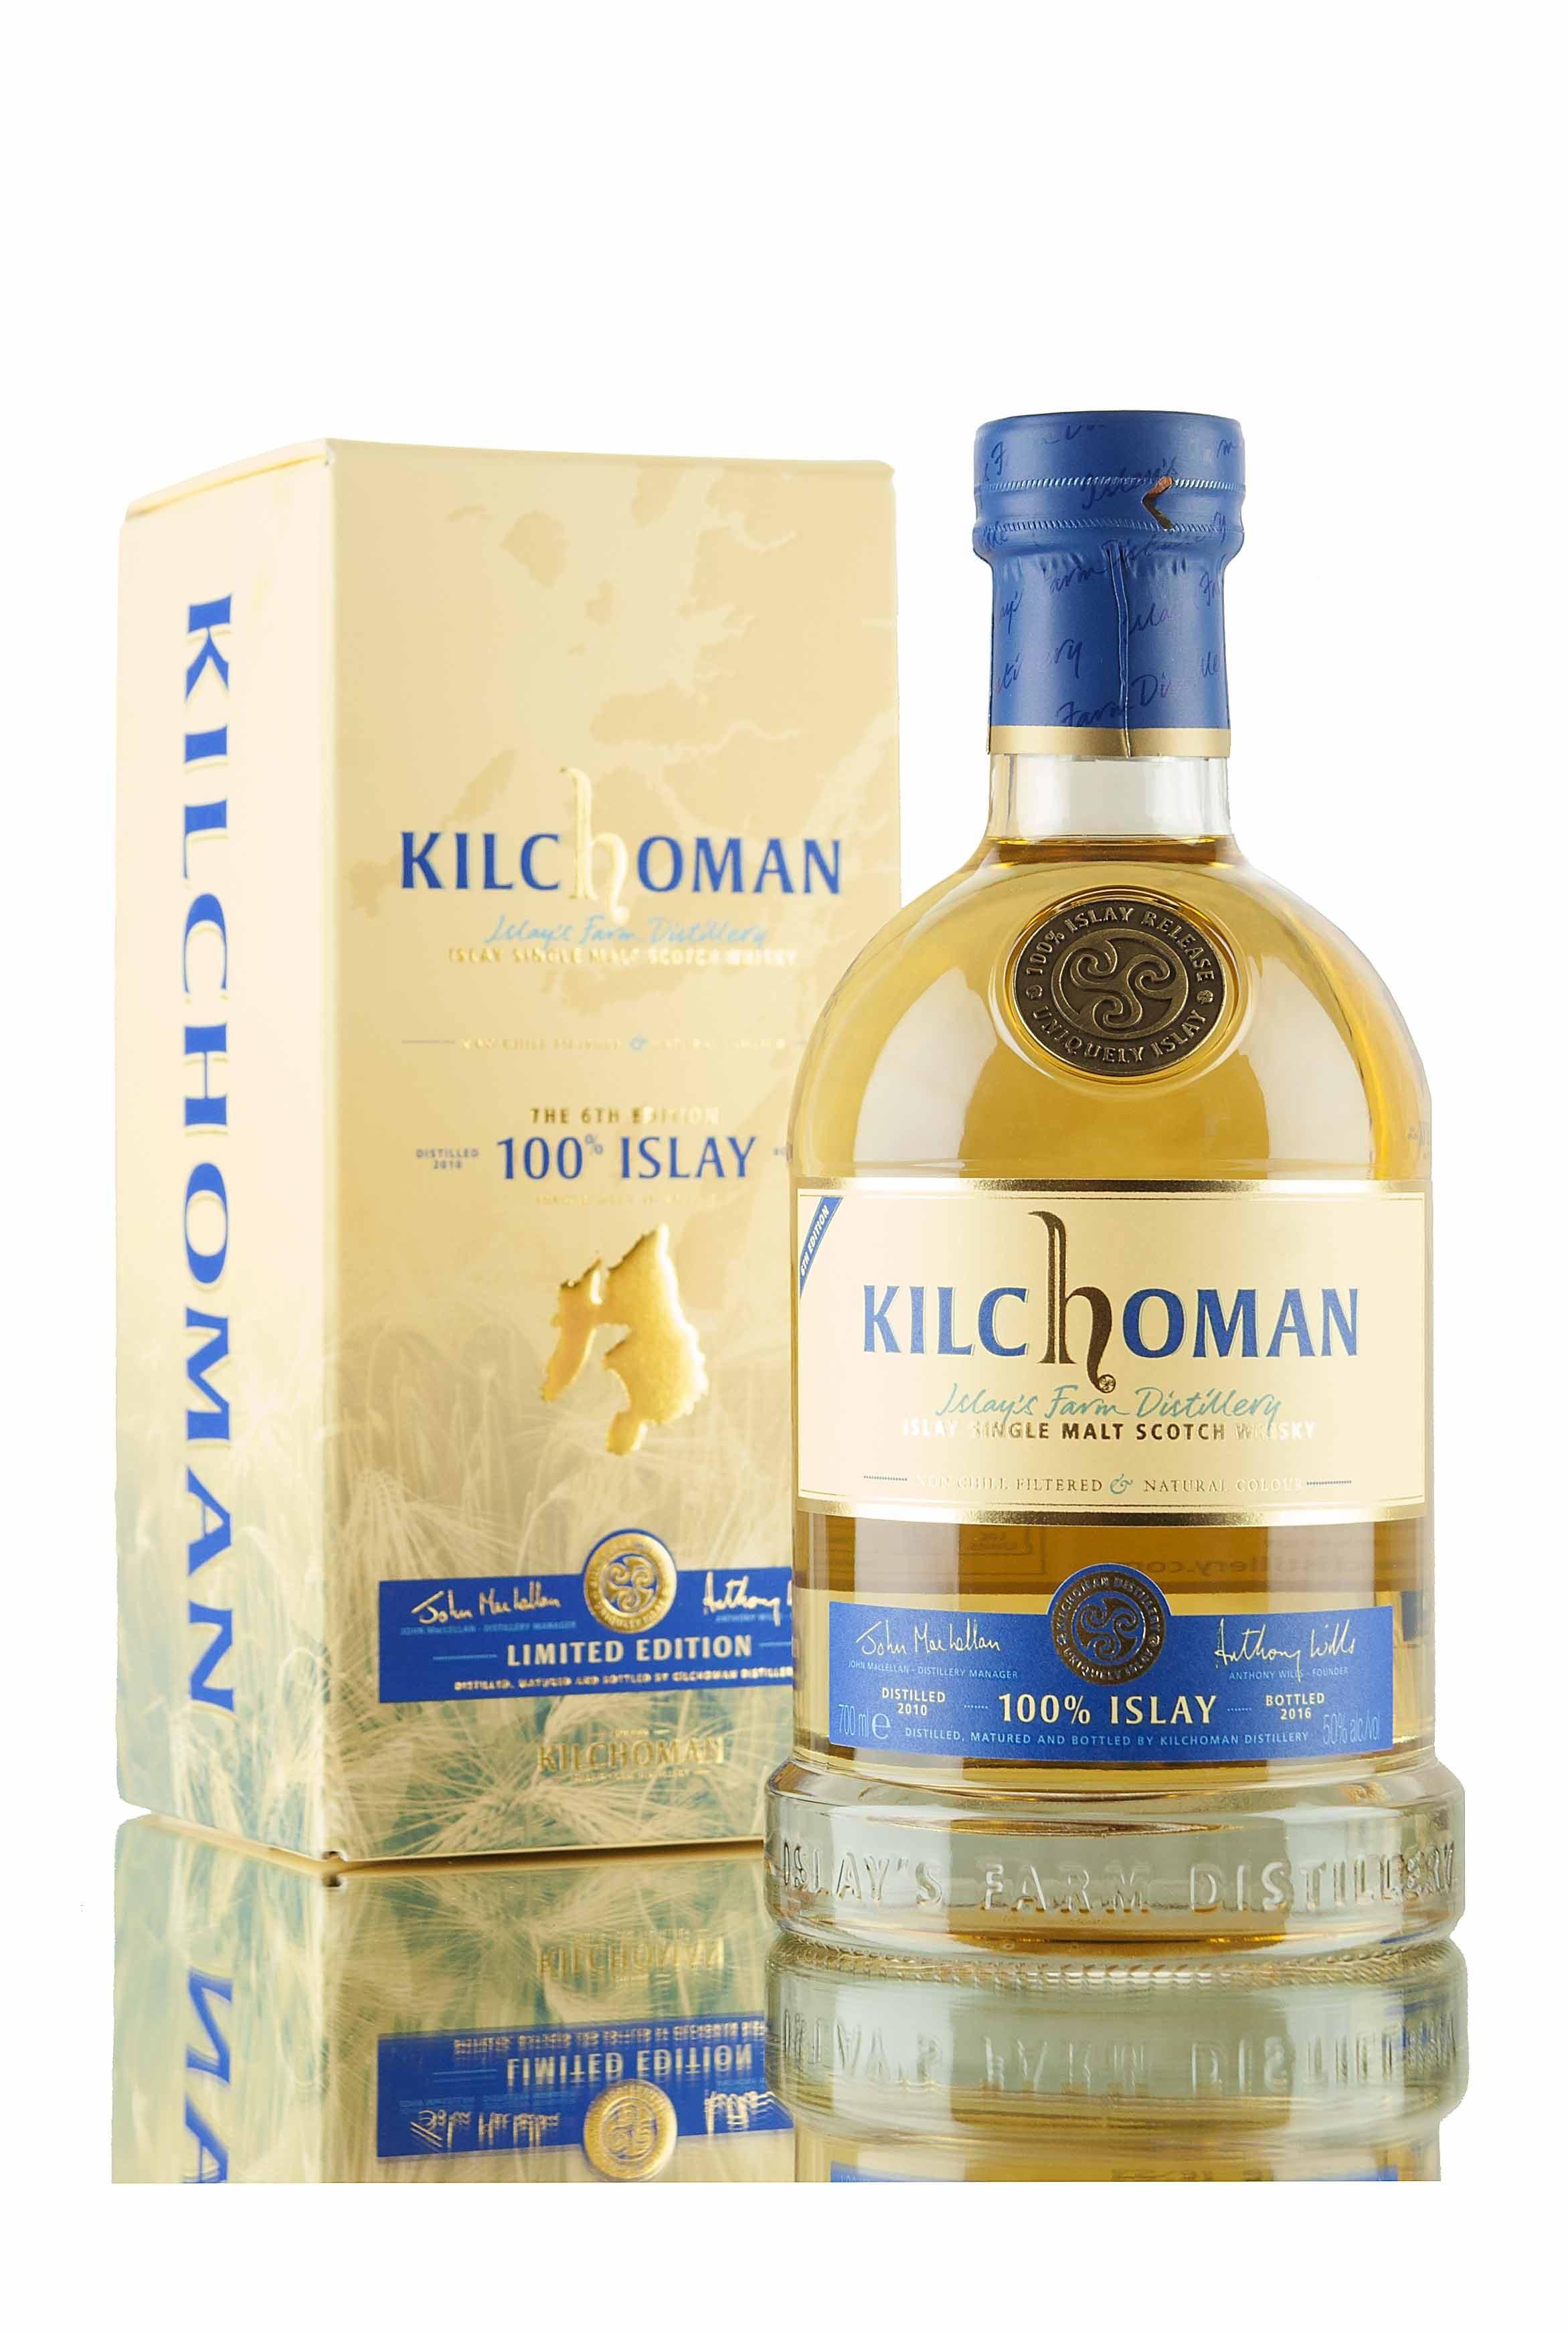 Kilchoman 7th edition